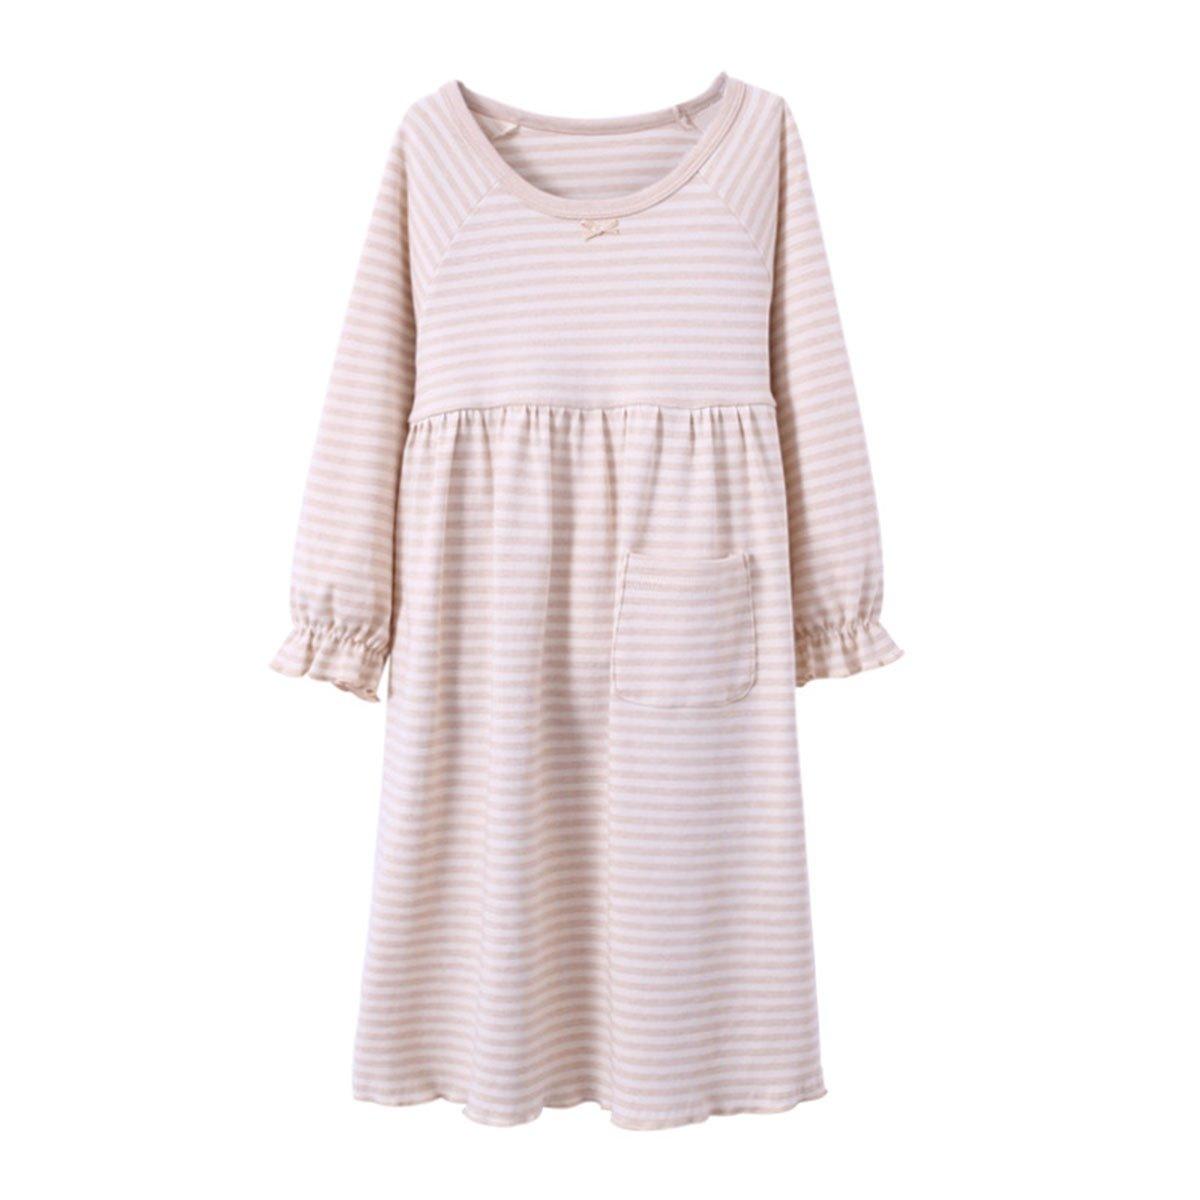 KINYBABY Girls Nightgown Sleep Shirts Cotton Long Sleeve Sleepwear with Pocket